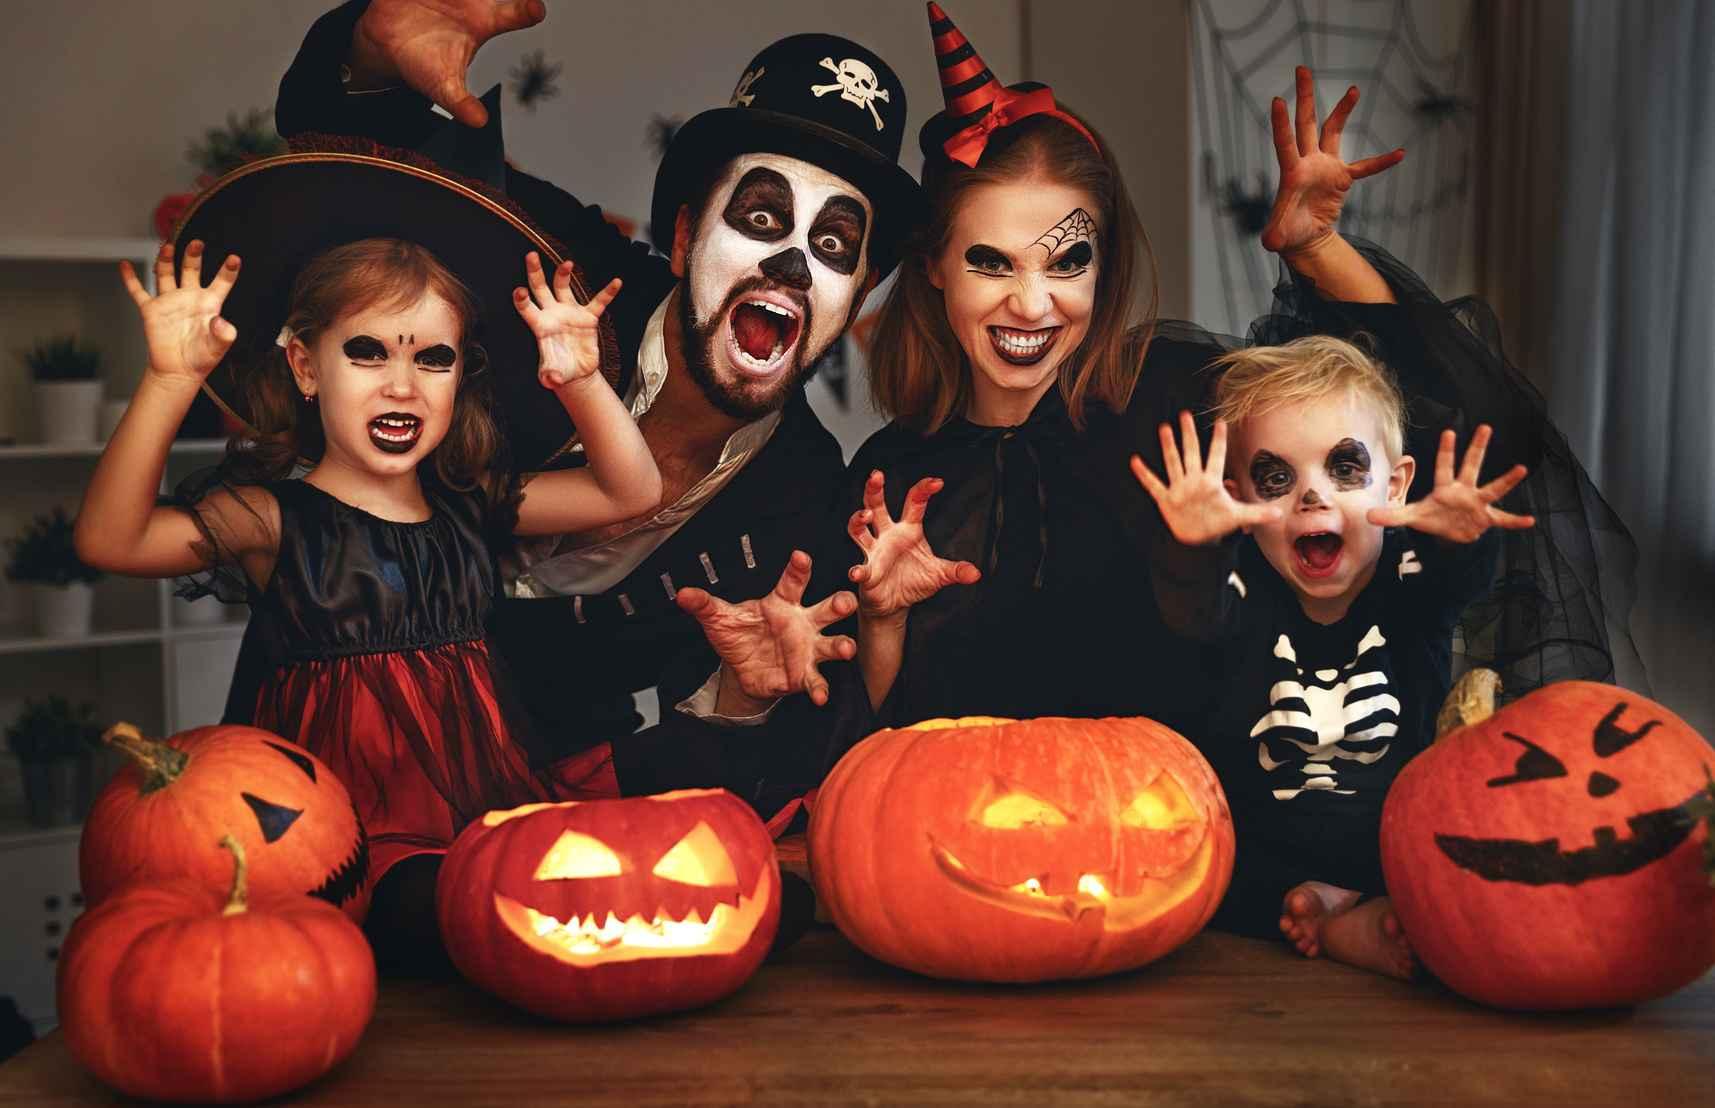 , HALLOWEEN: Μπορούμε να απαλλαγούμε από την μάσκα του τρόμου;